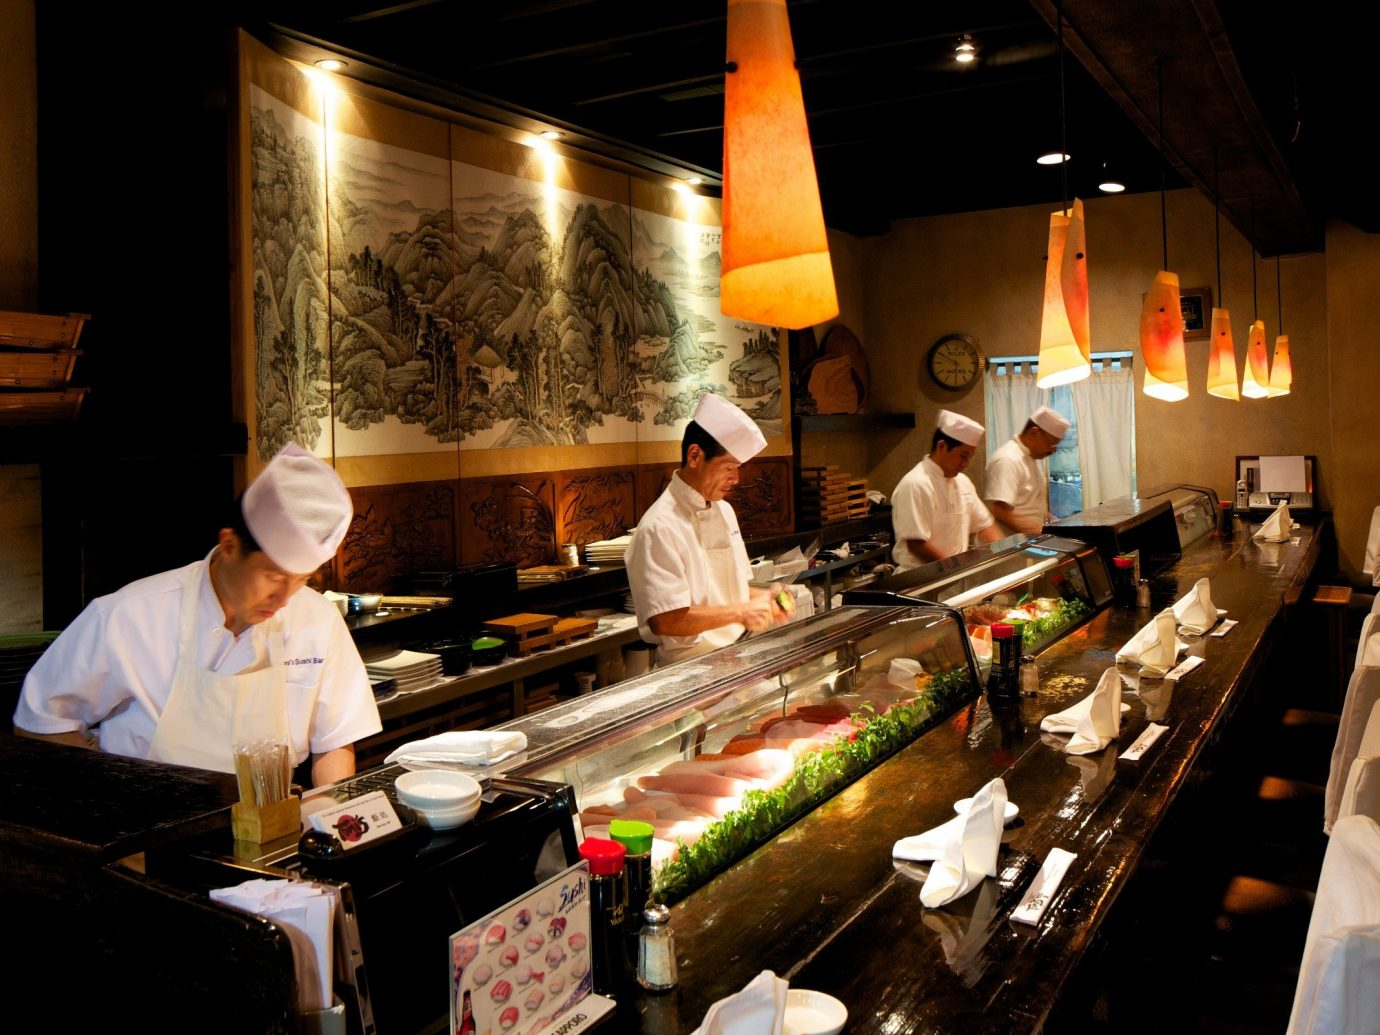 Travel Tips indoor person food cuisine dish preparing restaurant cook asian food buffet counter professional